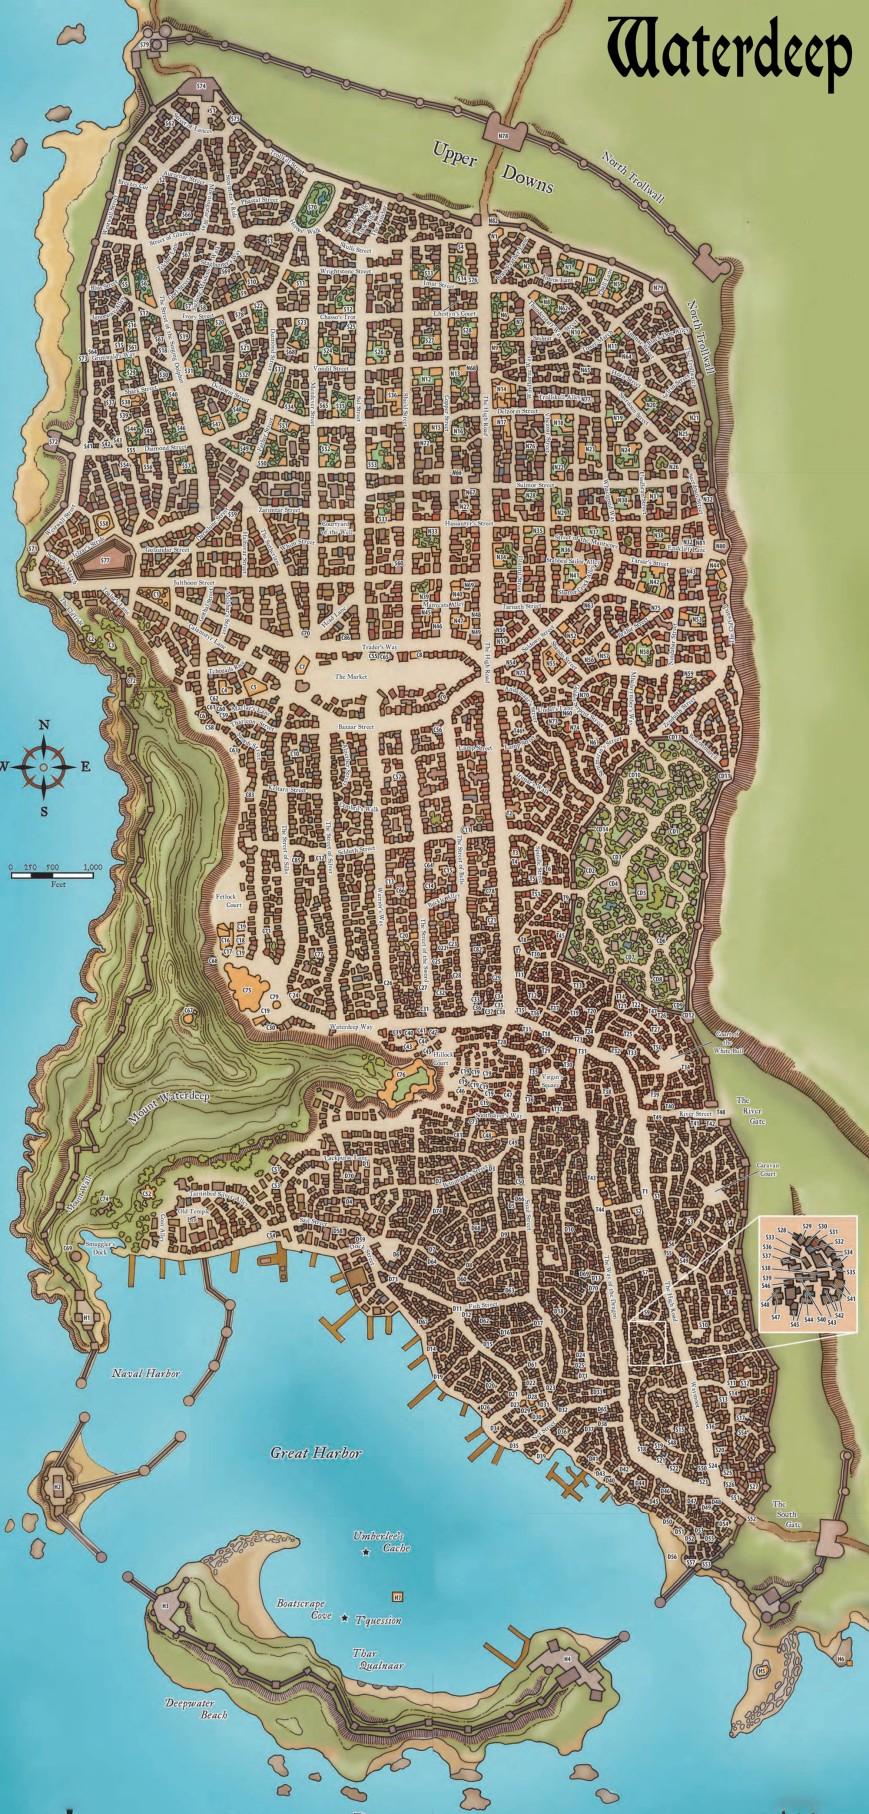 Waterdeep Map 2nd edition